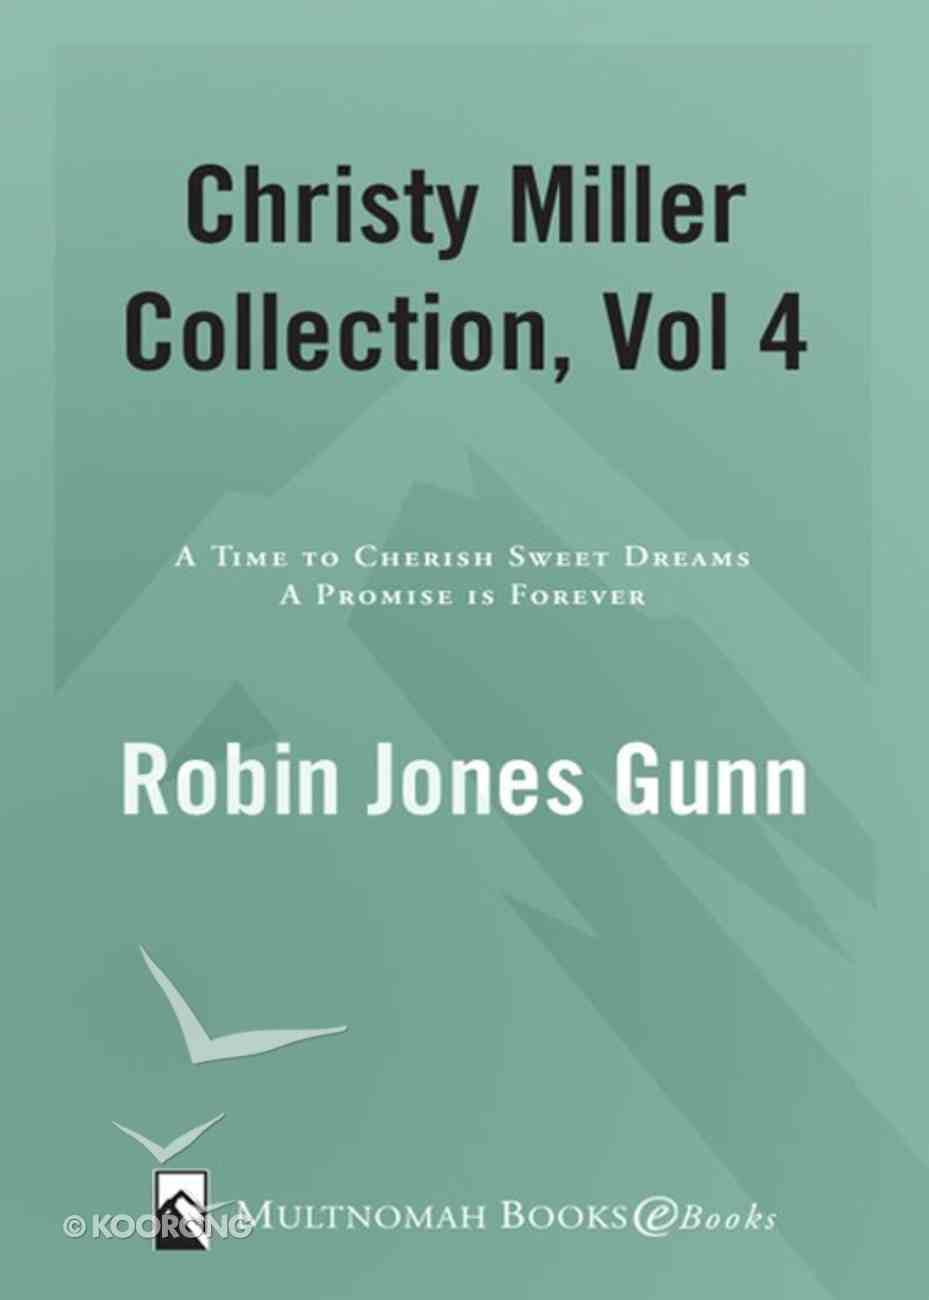 Christy Miller Collection, Volume 4 eBook